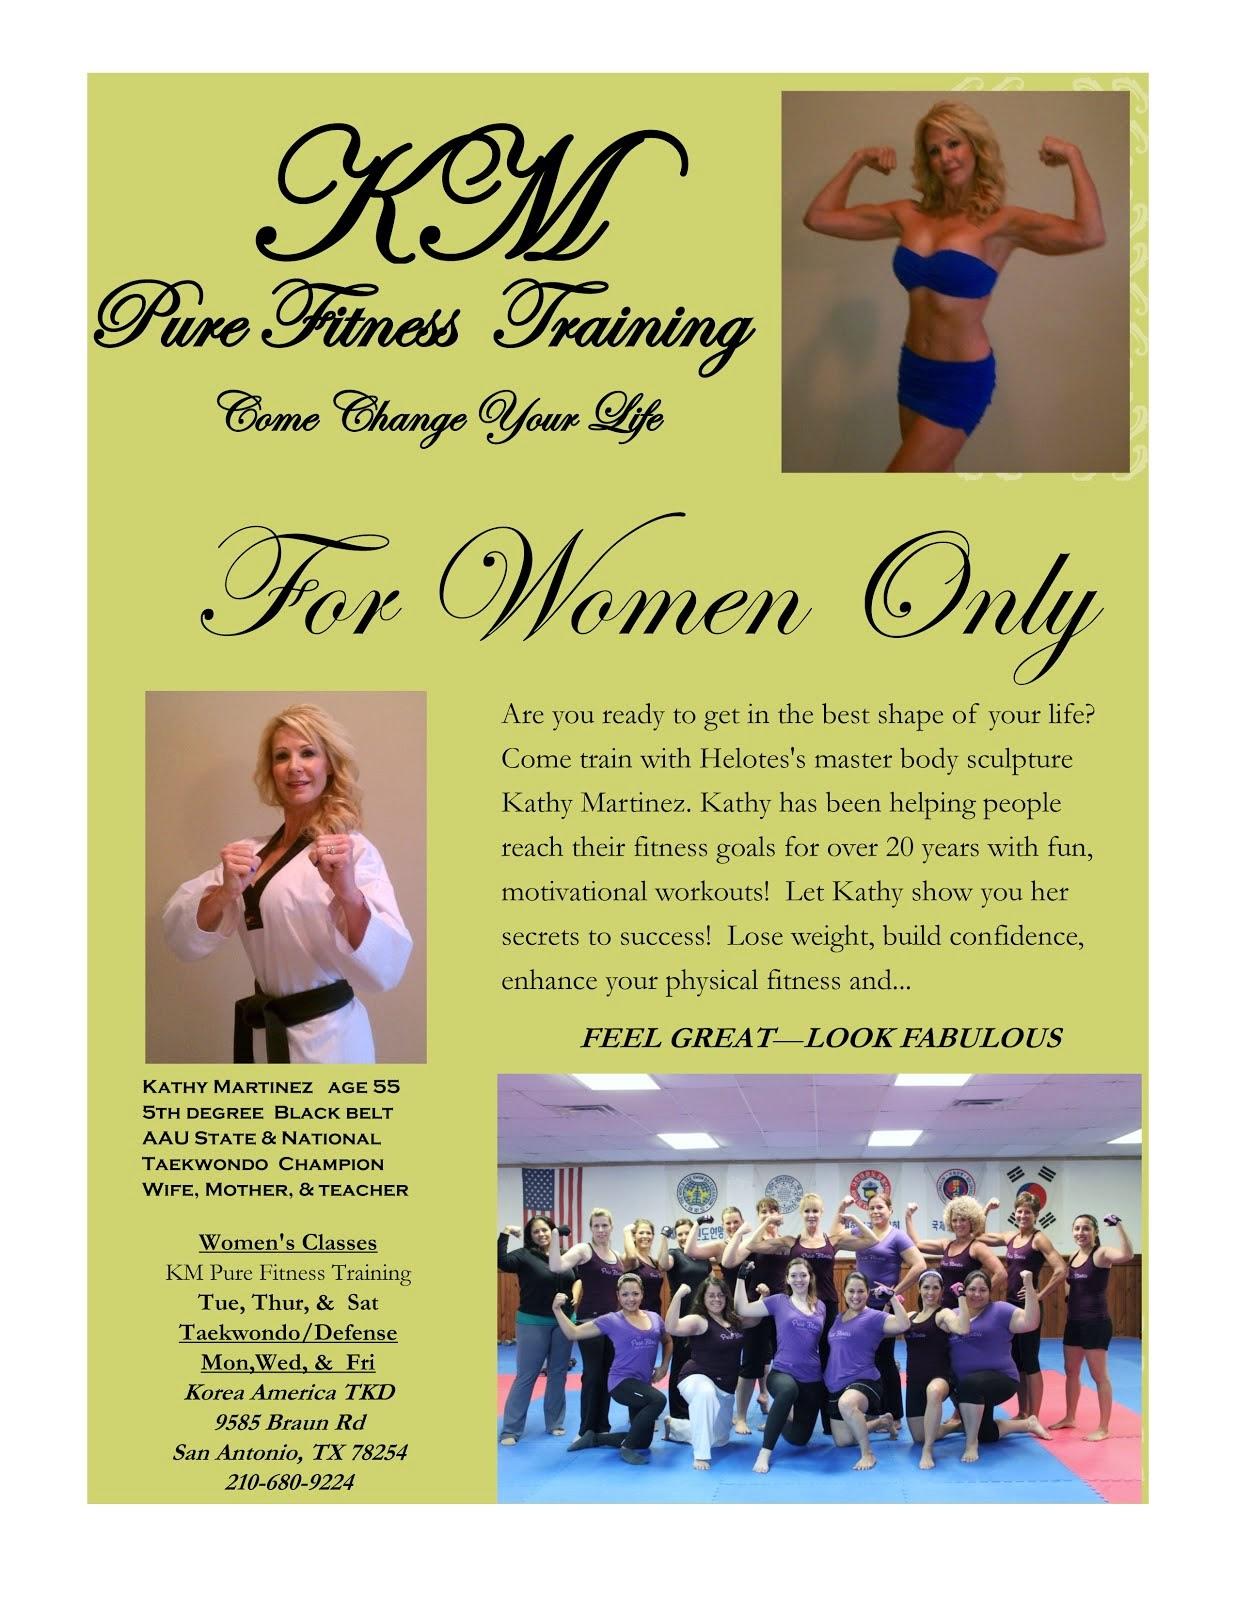 KM Pure Fitness Training